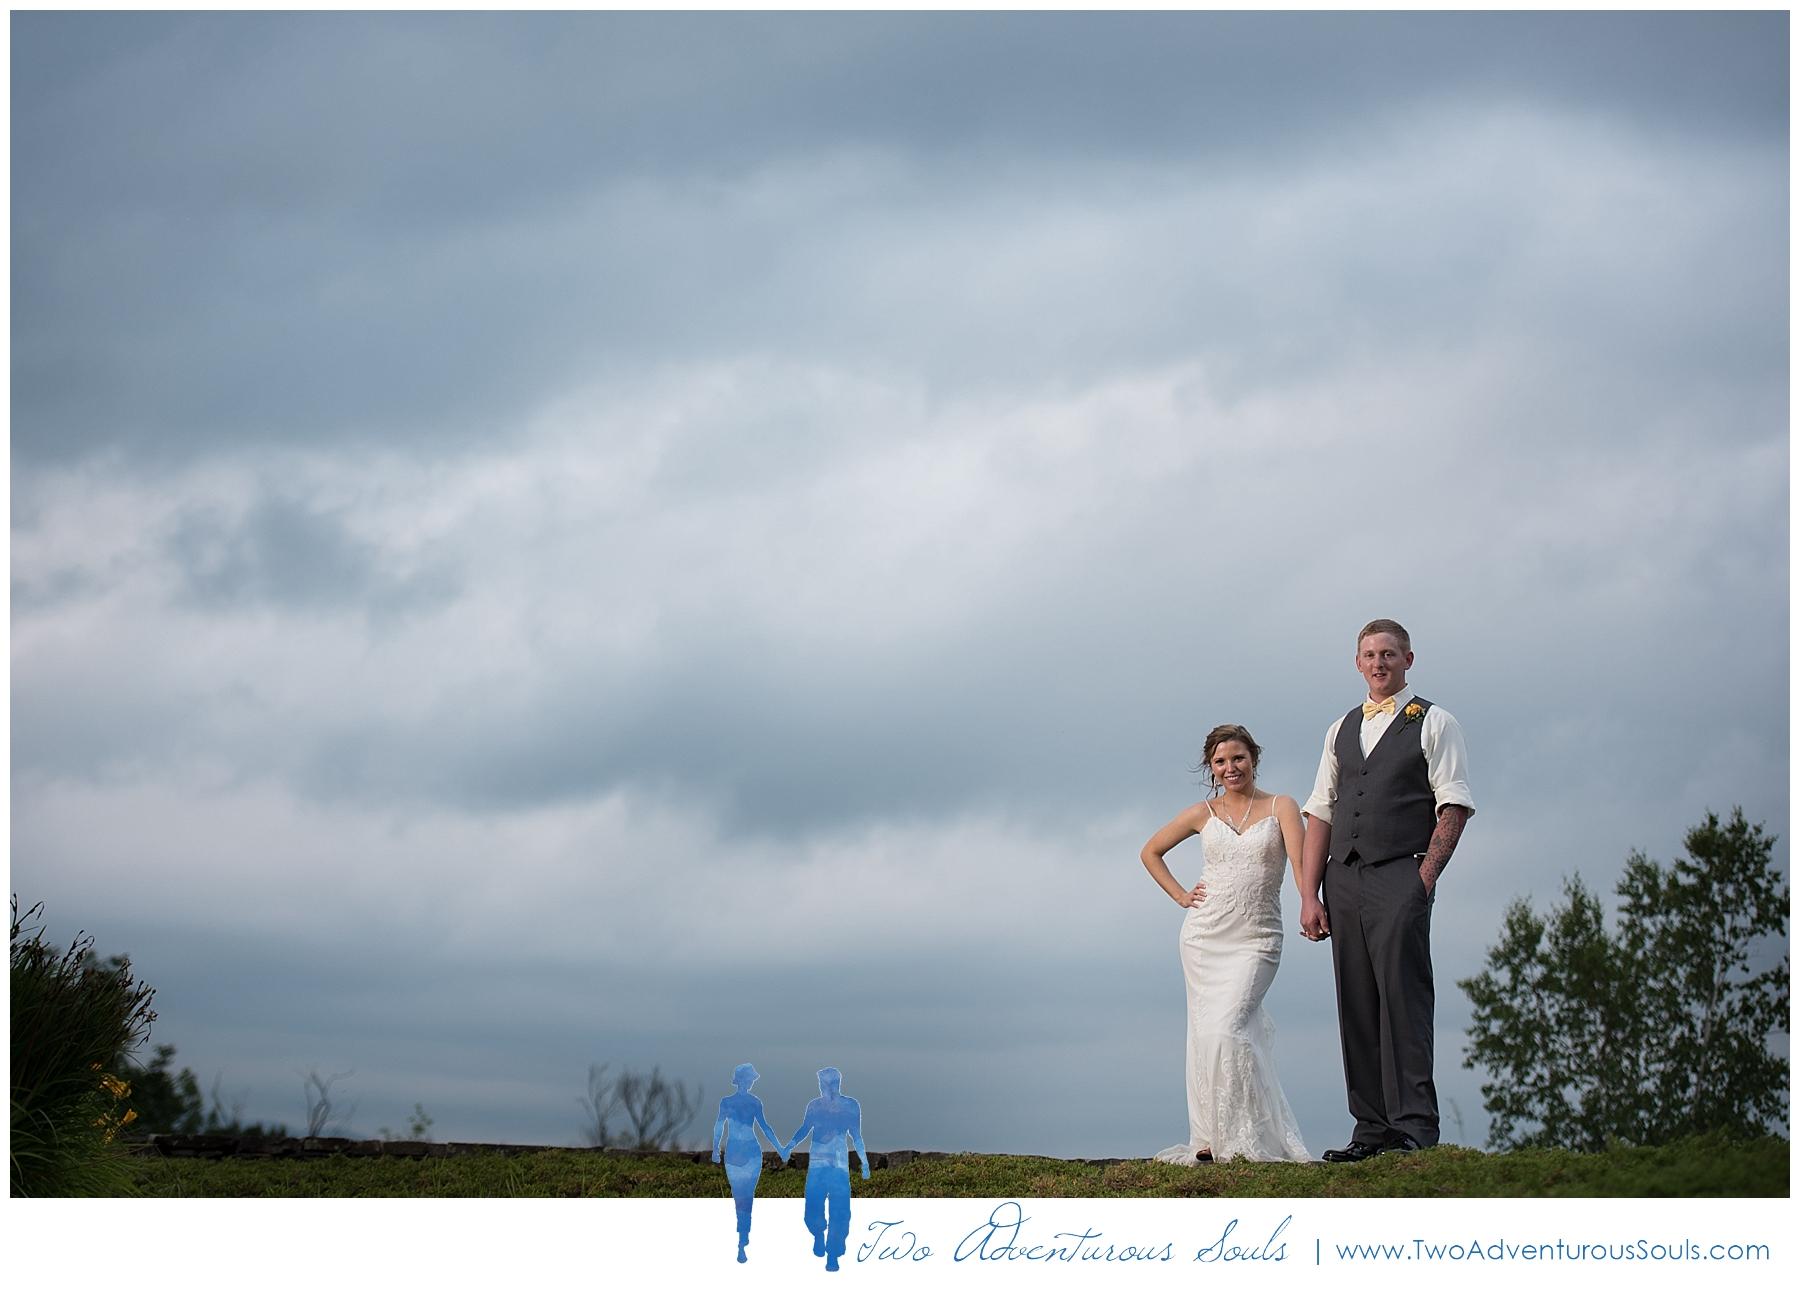 Sunday River Wedding, Maine Wedding Photographers - Sunday River Wedding, Rainy Wedding